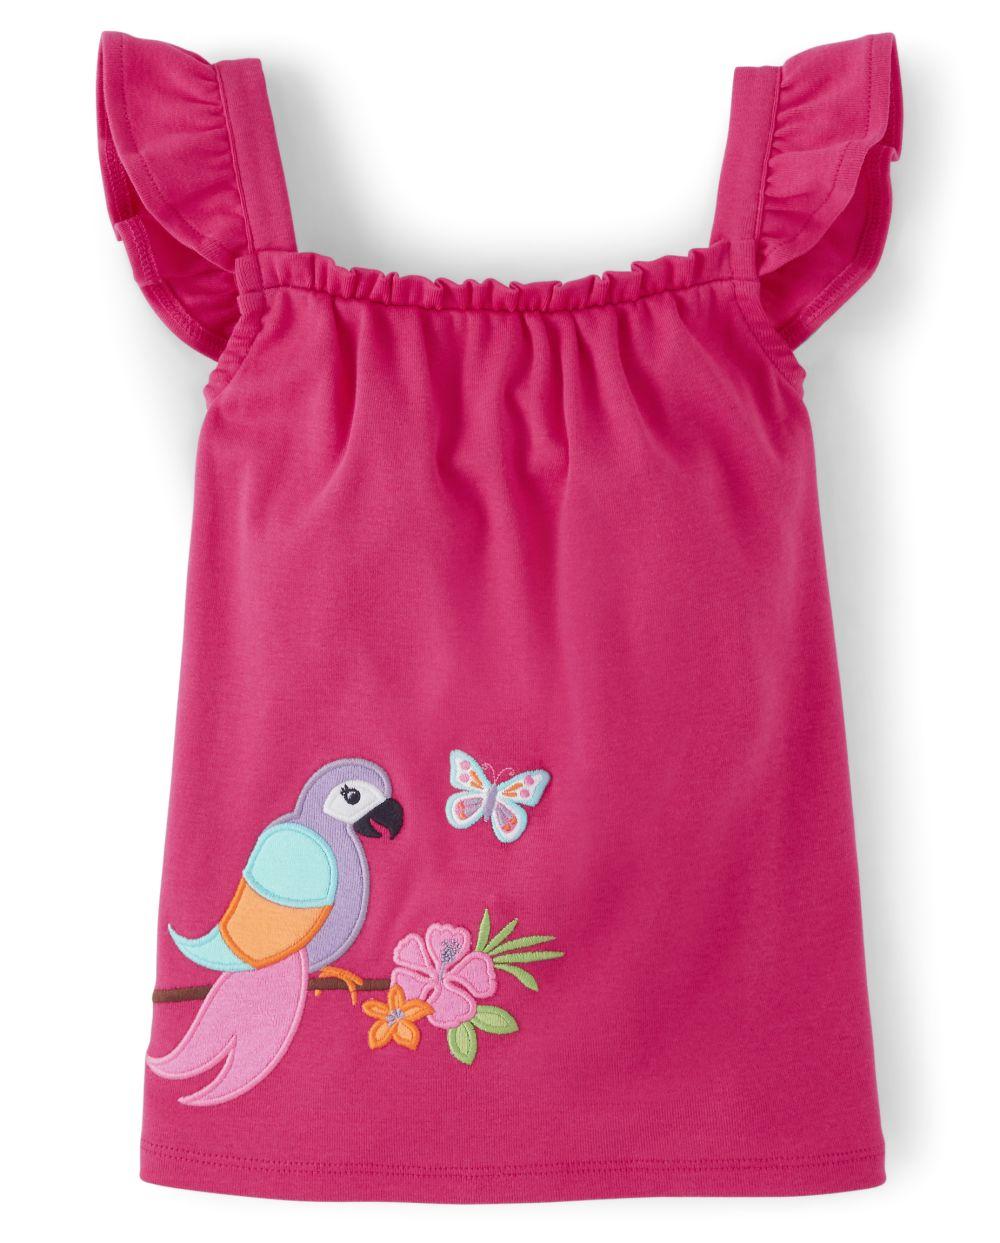 Girls Applique Parrot Ruffle Top - Summer Safari